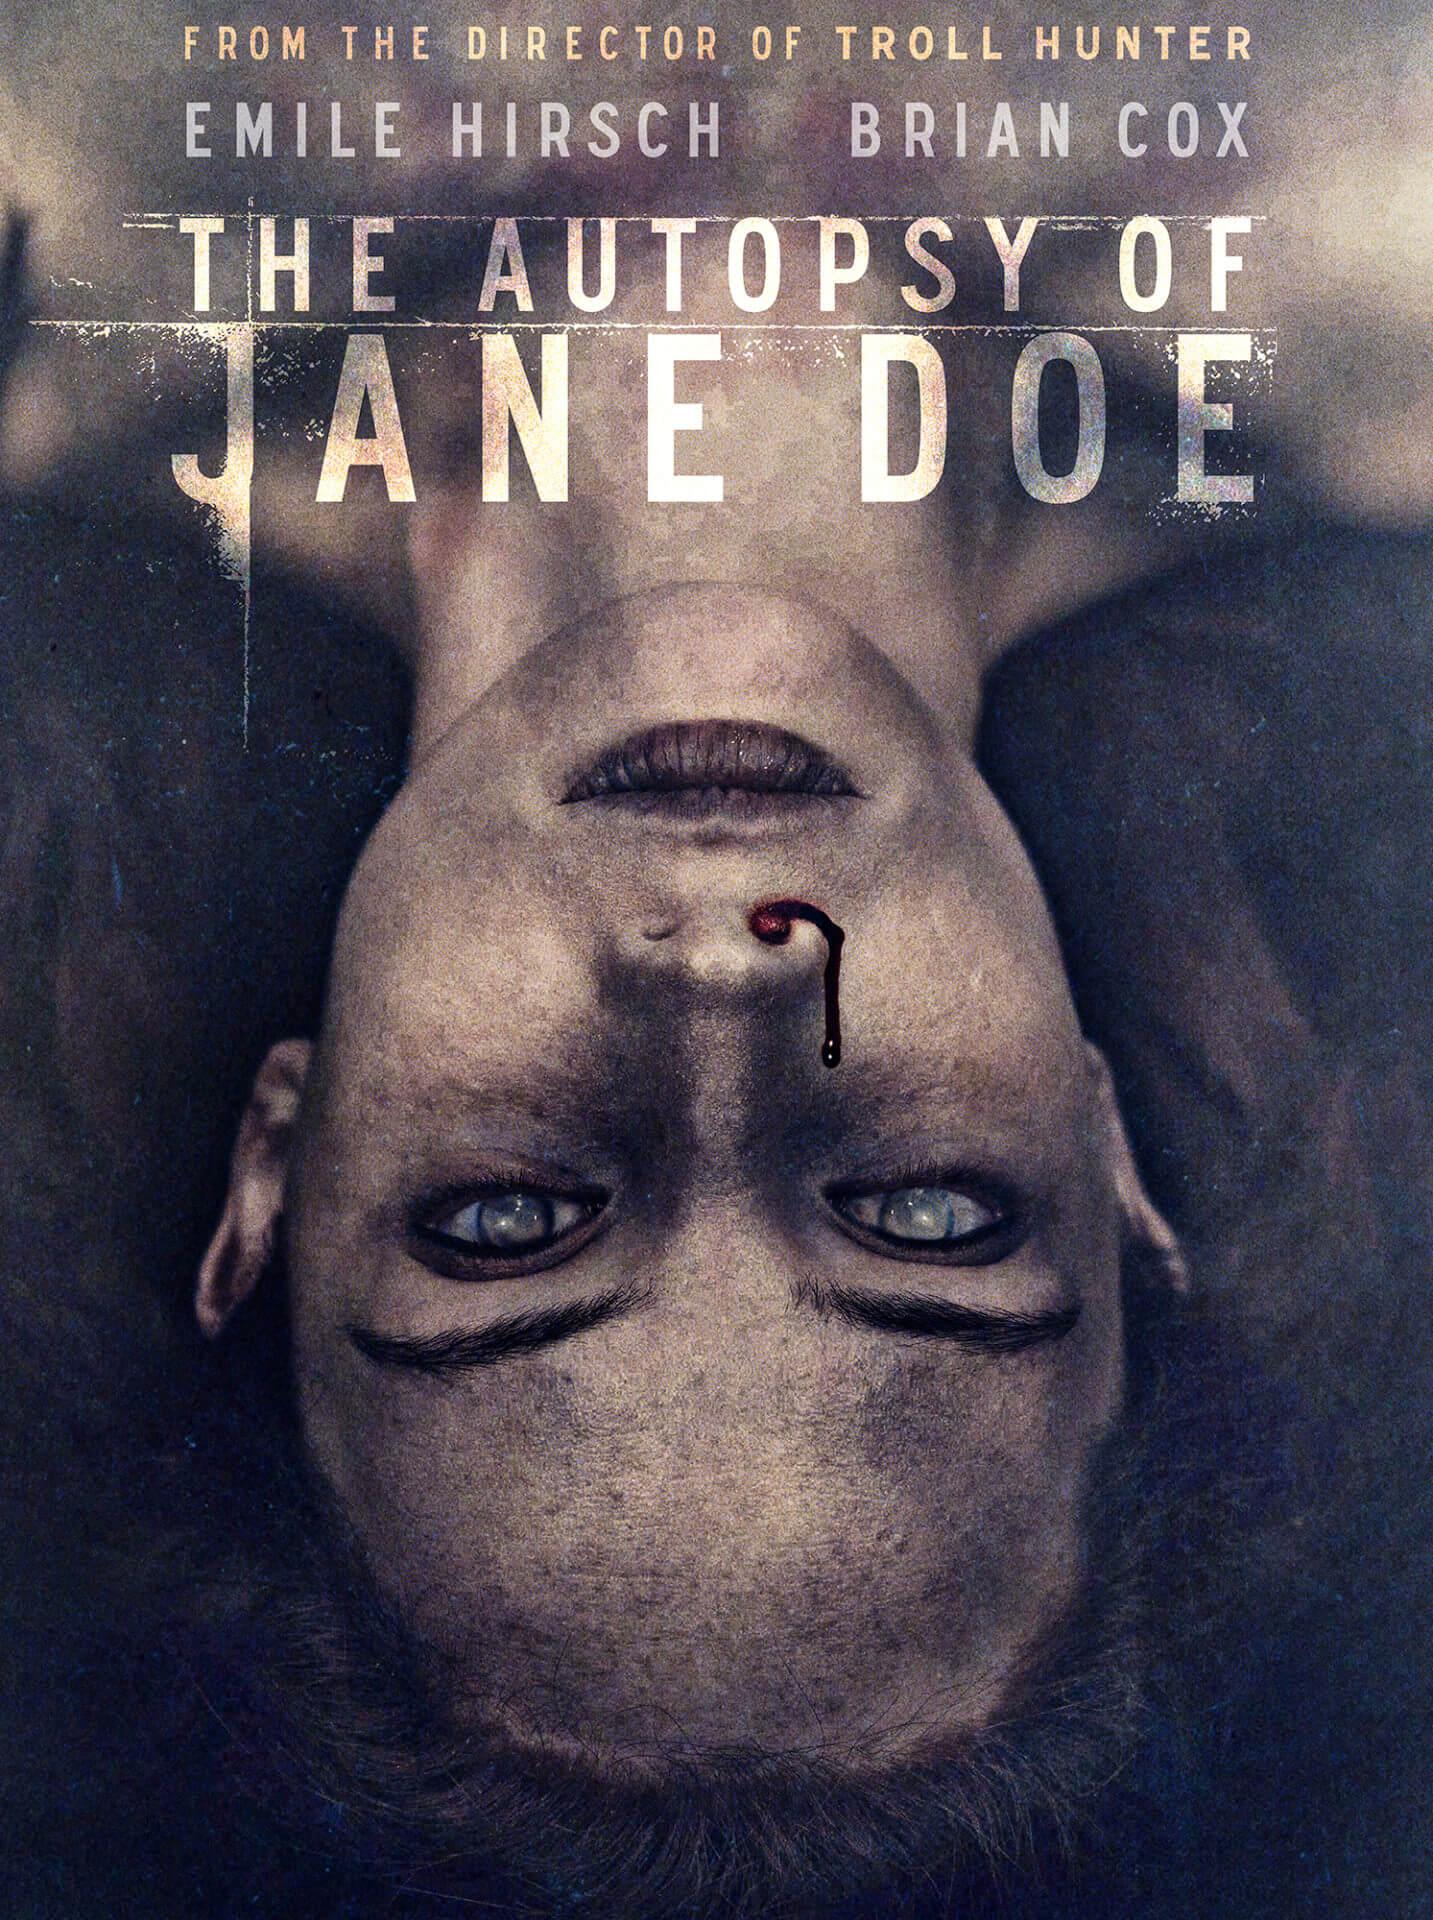 The autopsy of jane doe wiki